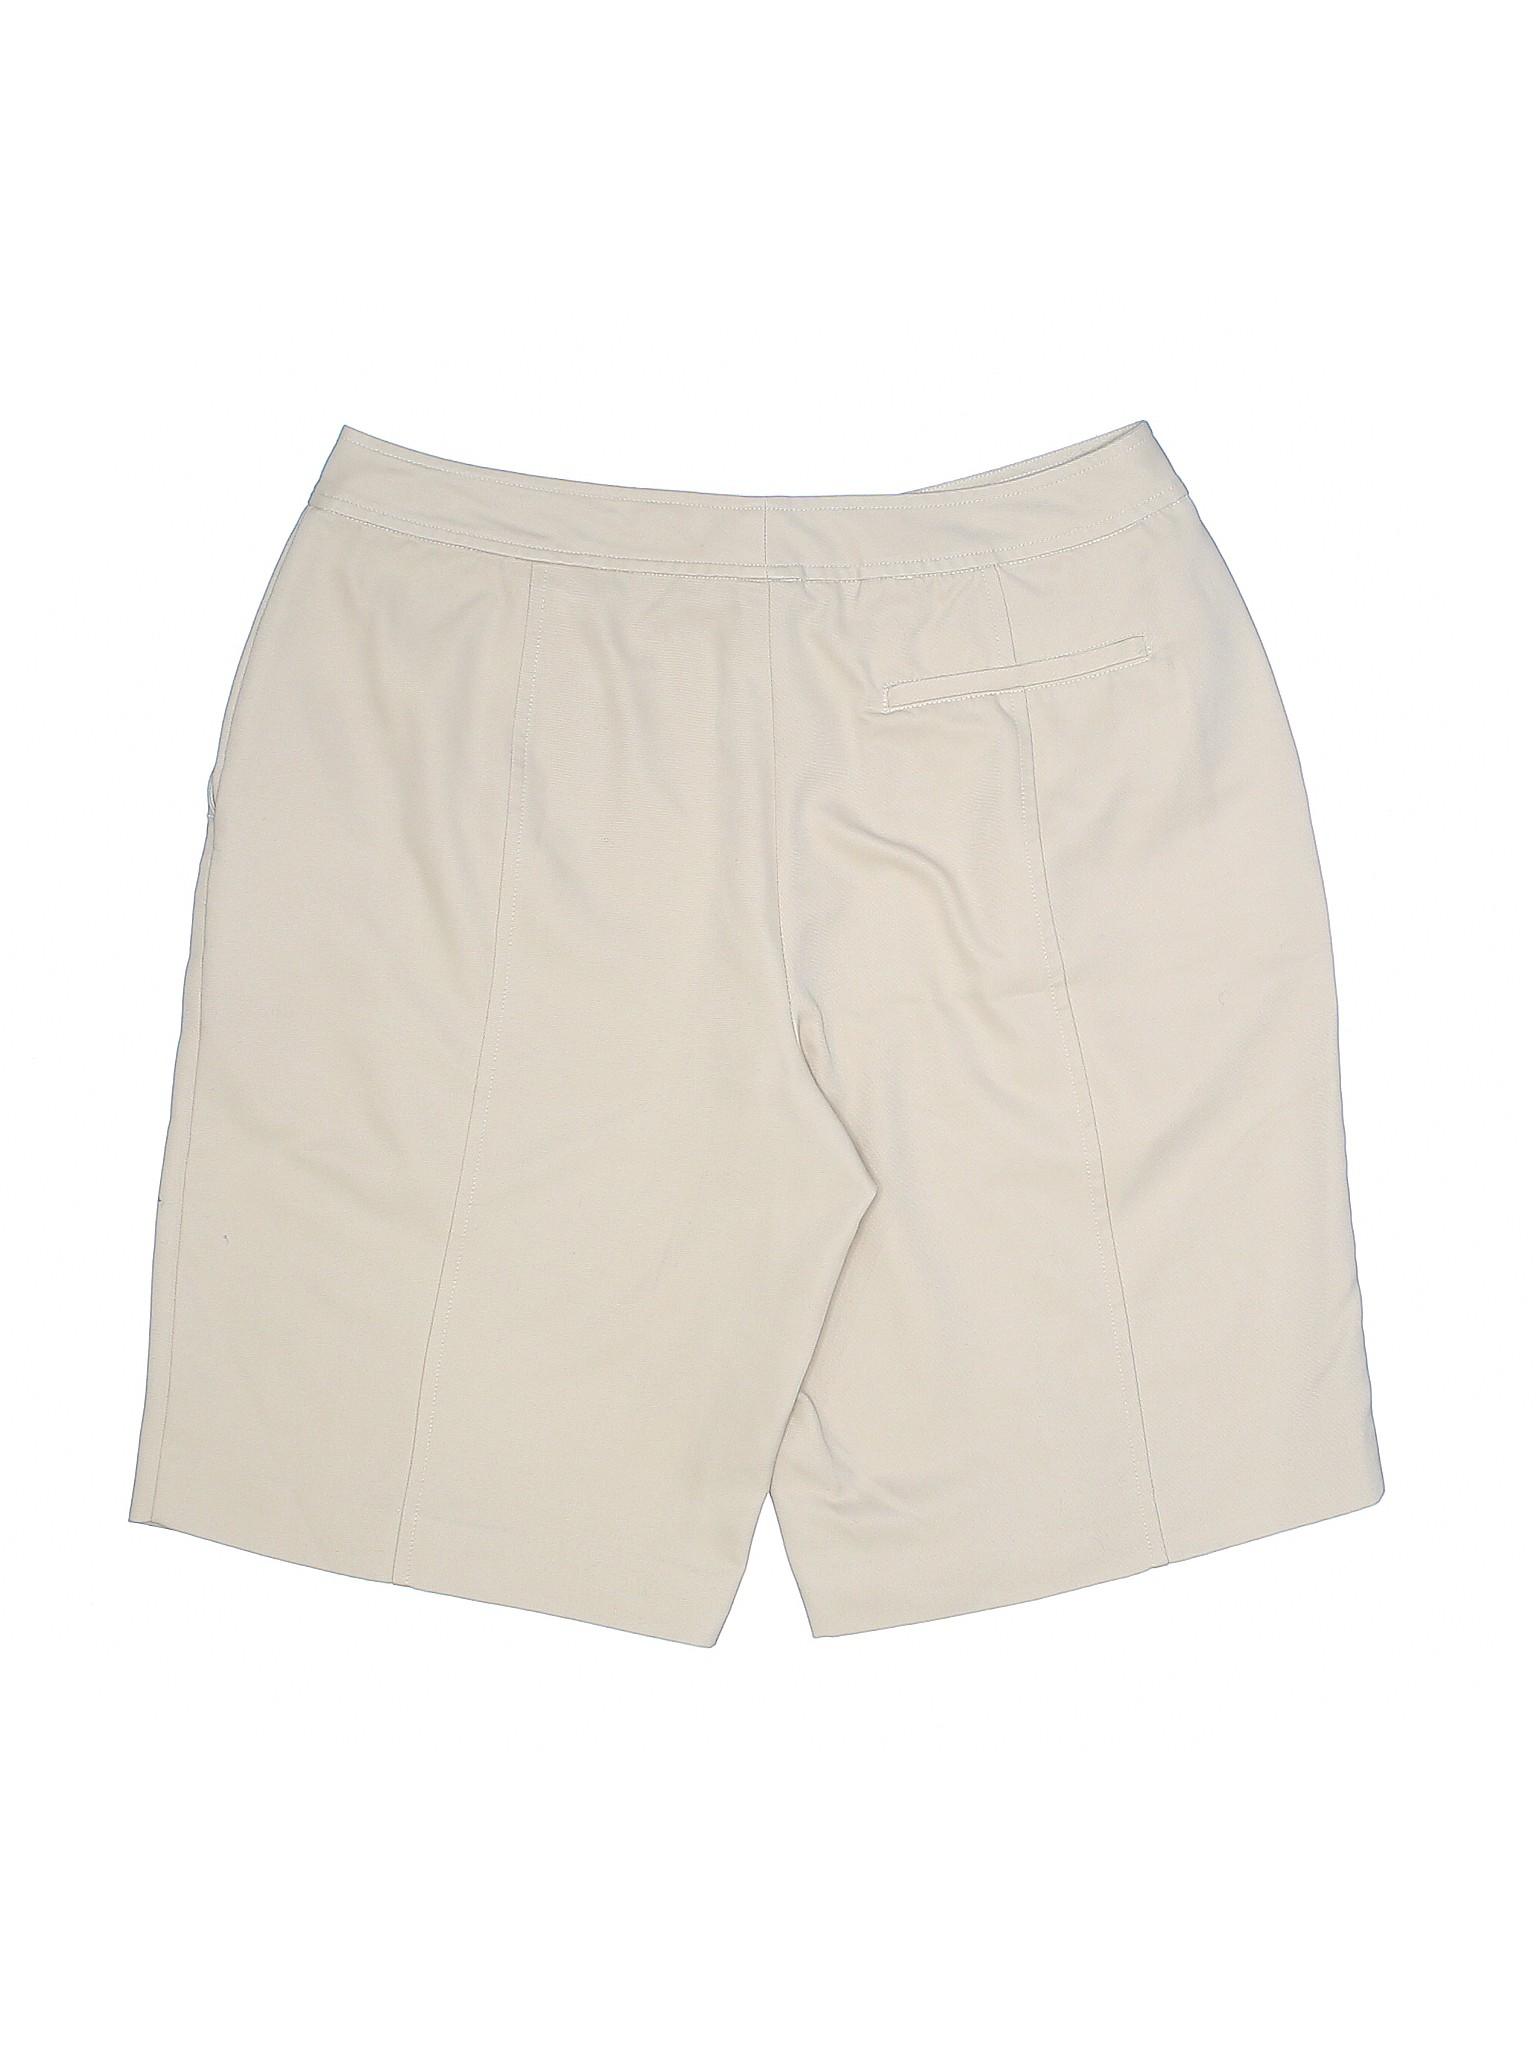 Shorts Boutique Boutique IZOD Shorts IZOD vaUxUdPq